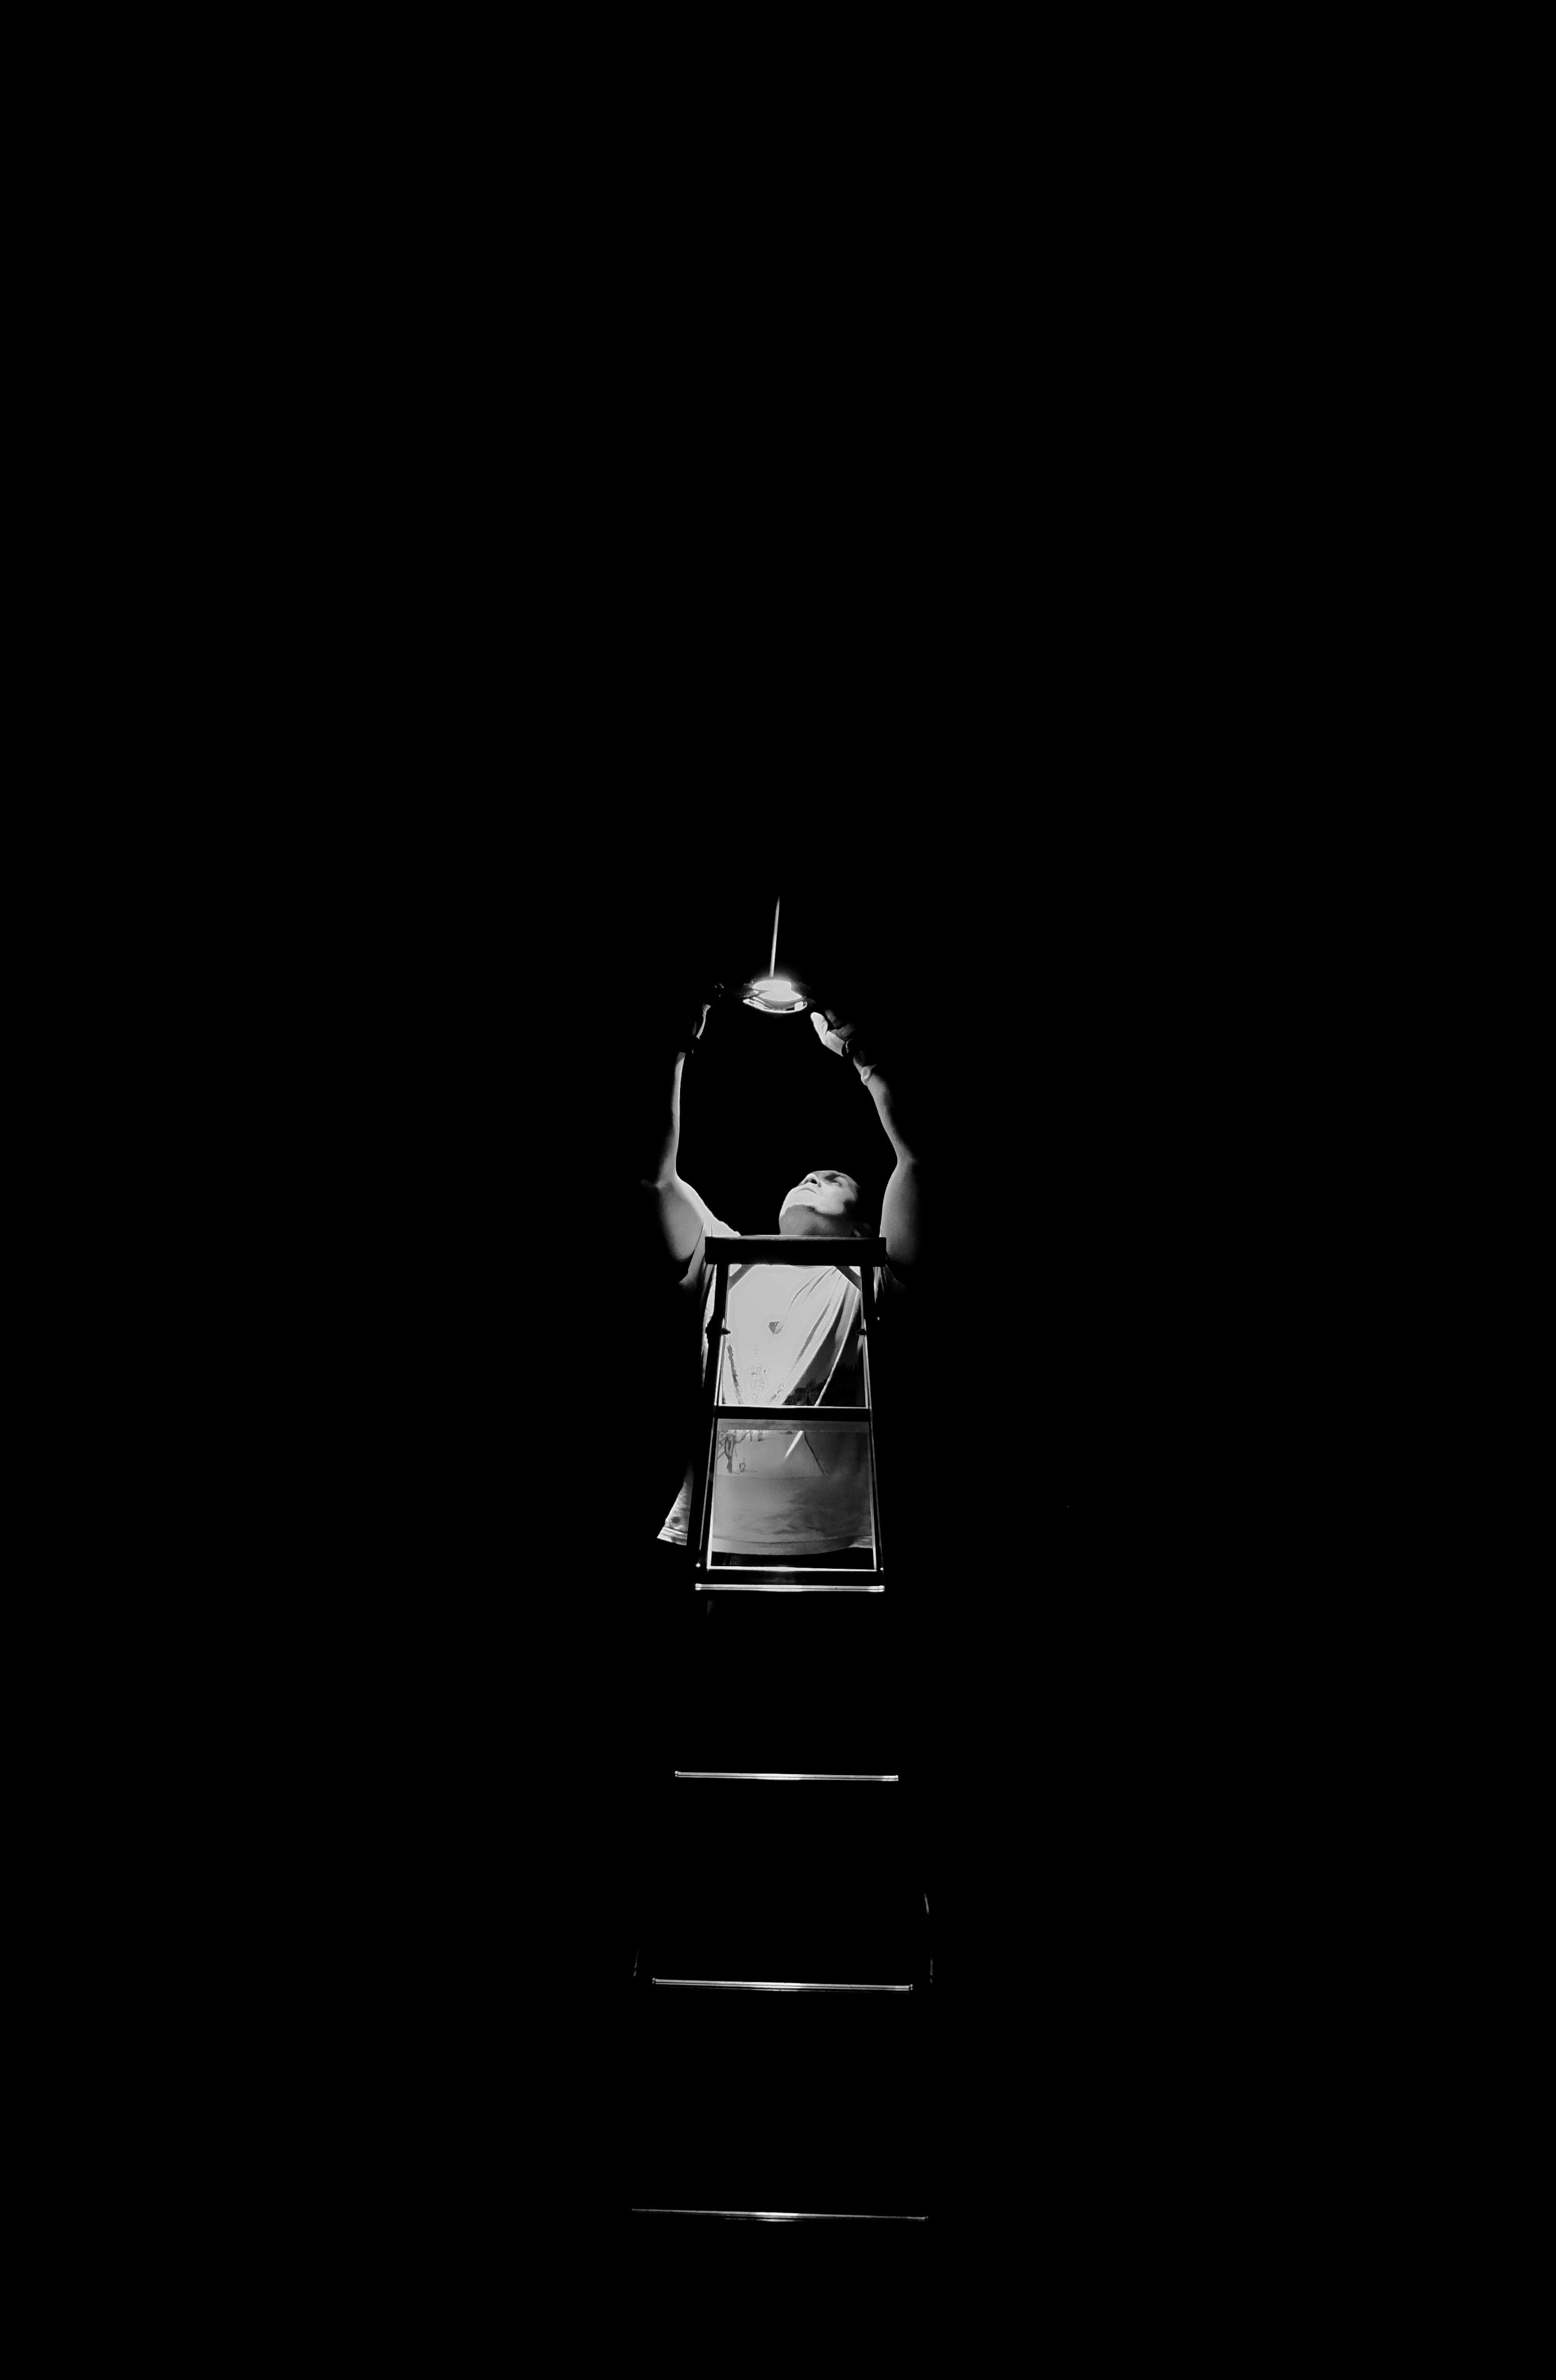 Free Unsplash photo from Yousef Al Nasser